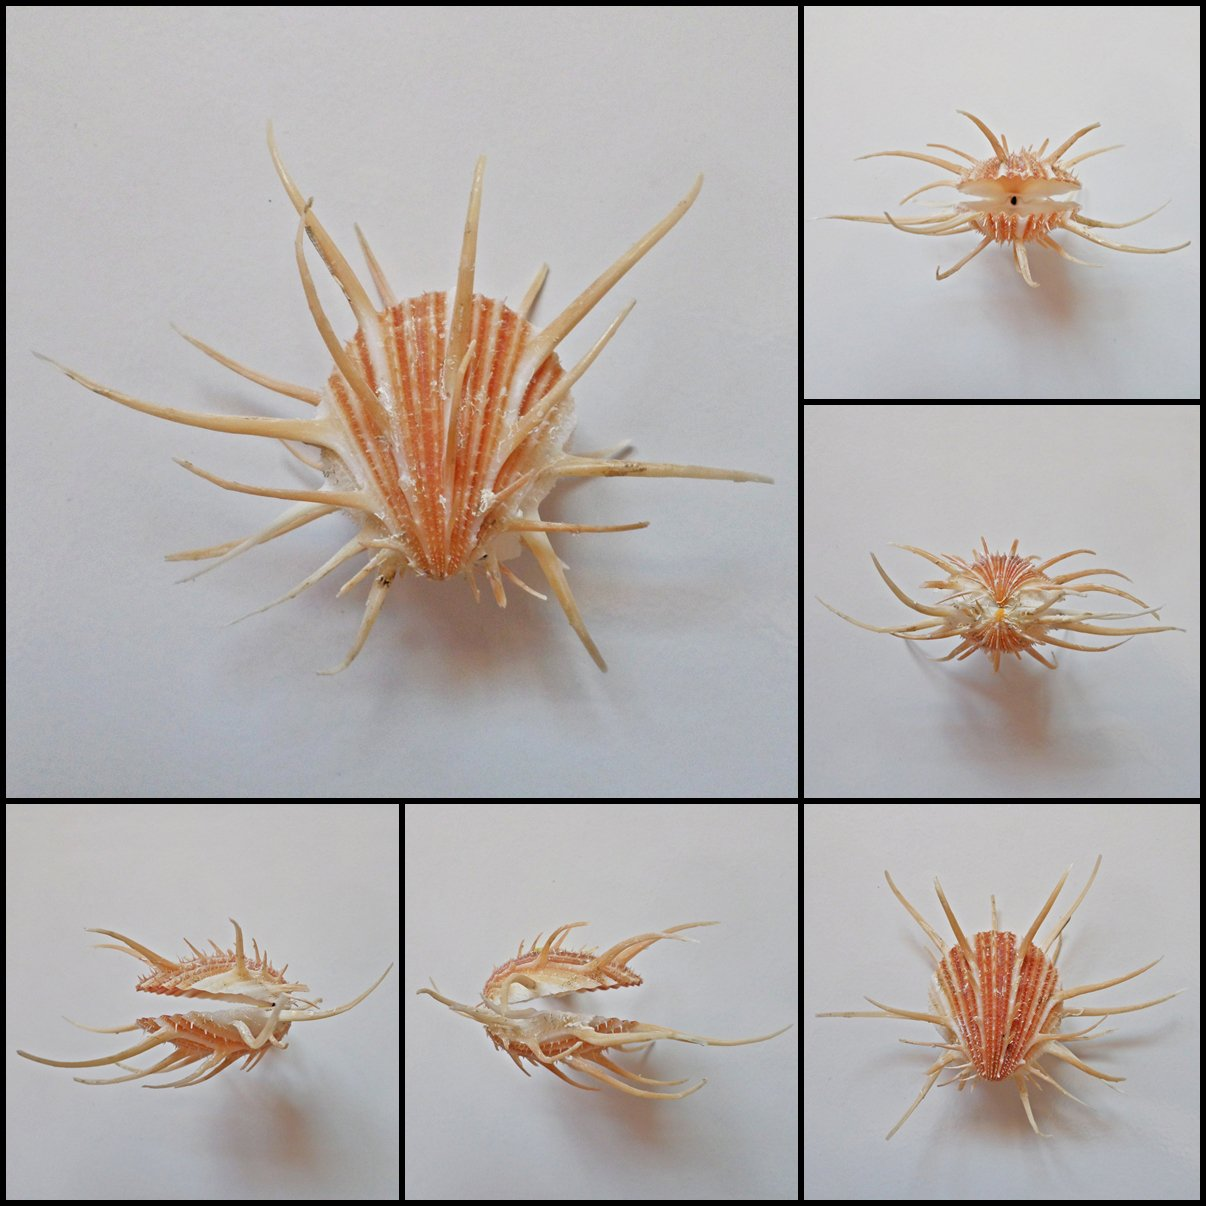 BDA02 - Spondylus imperialis